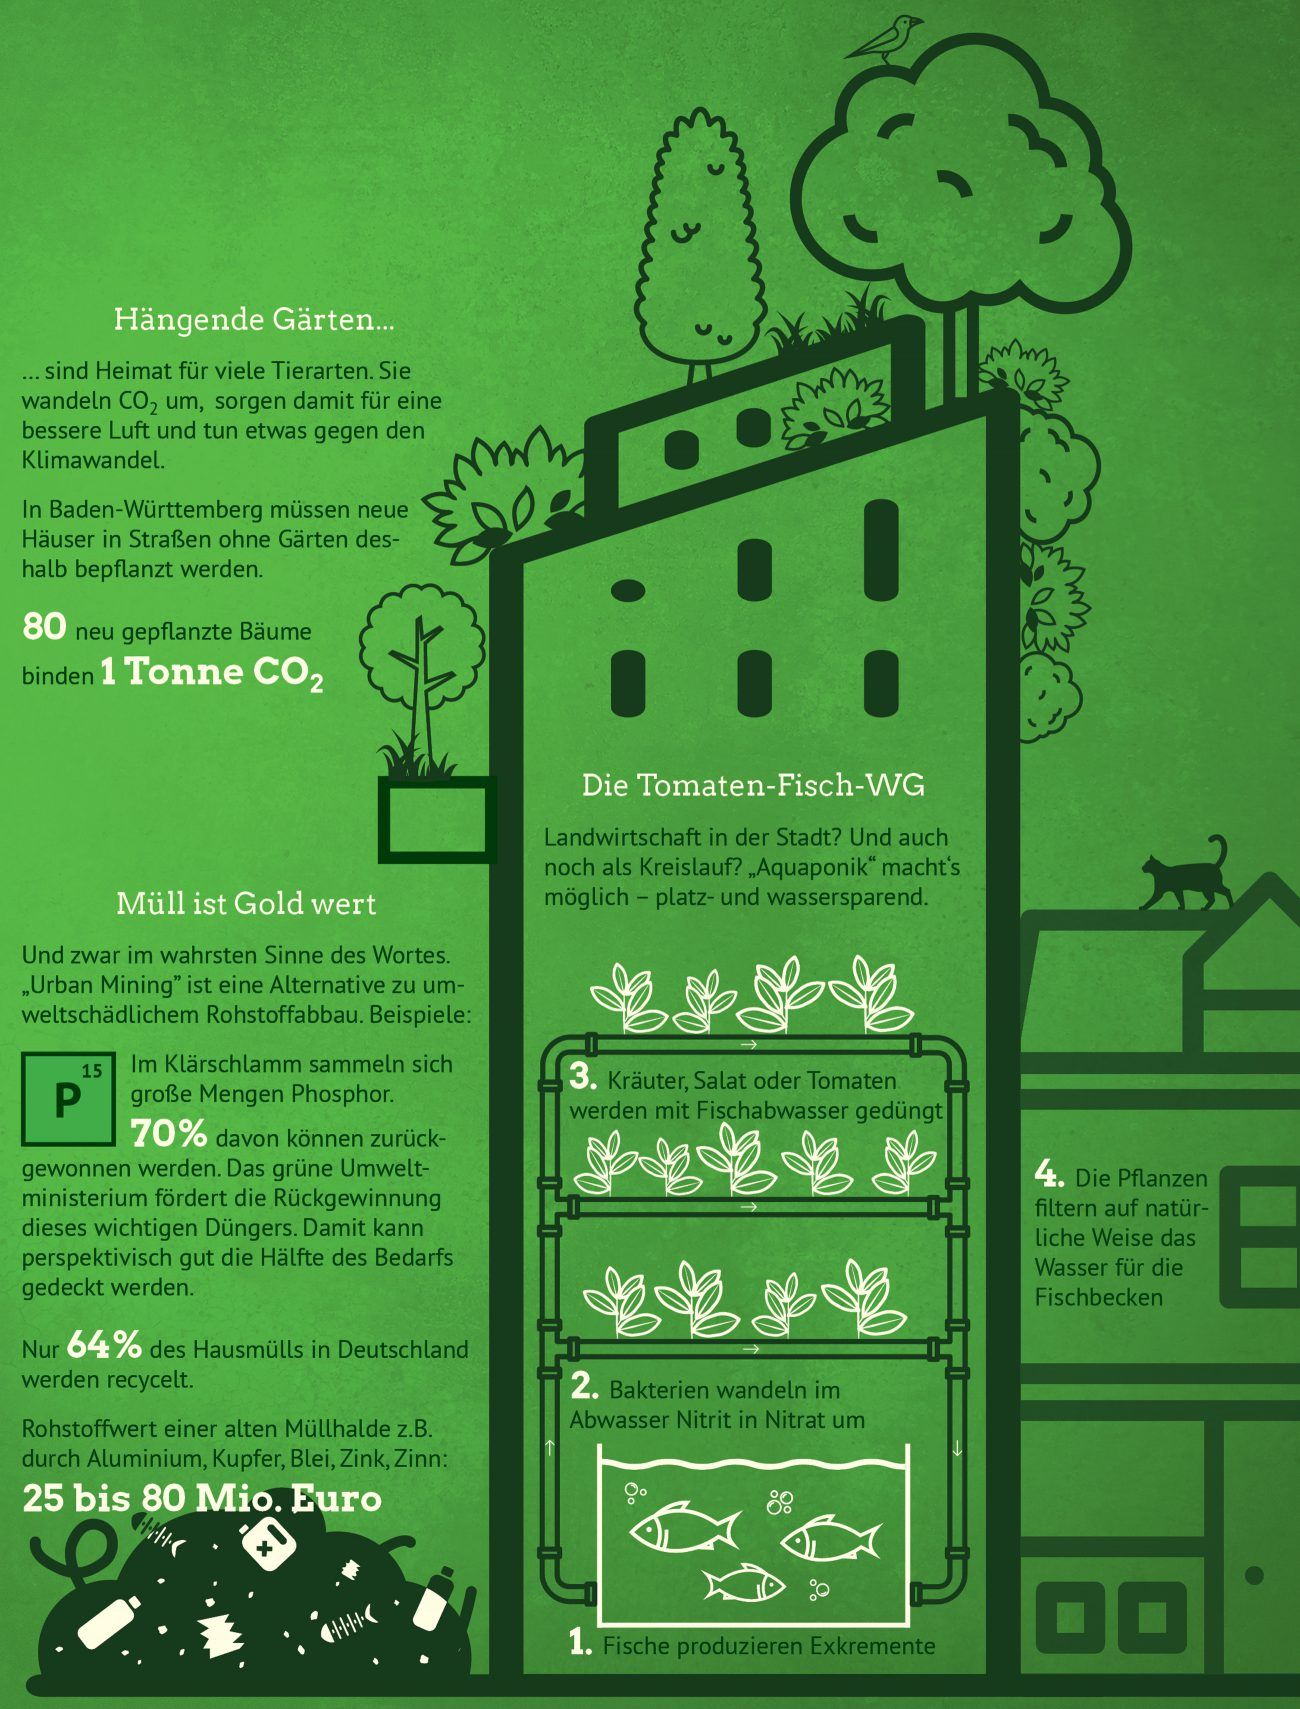 Infografik: Innovation ist unsere Natur